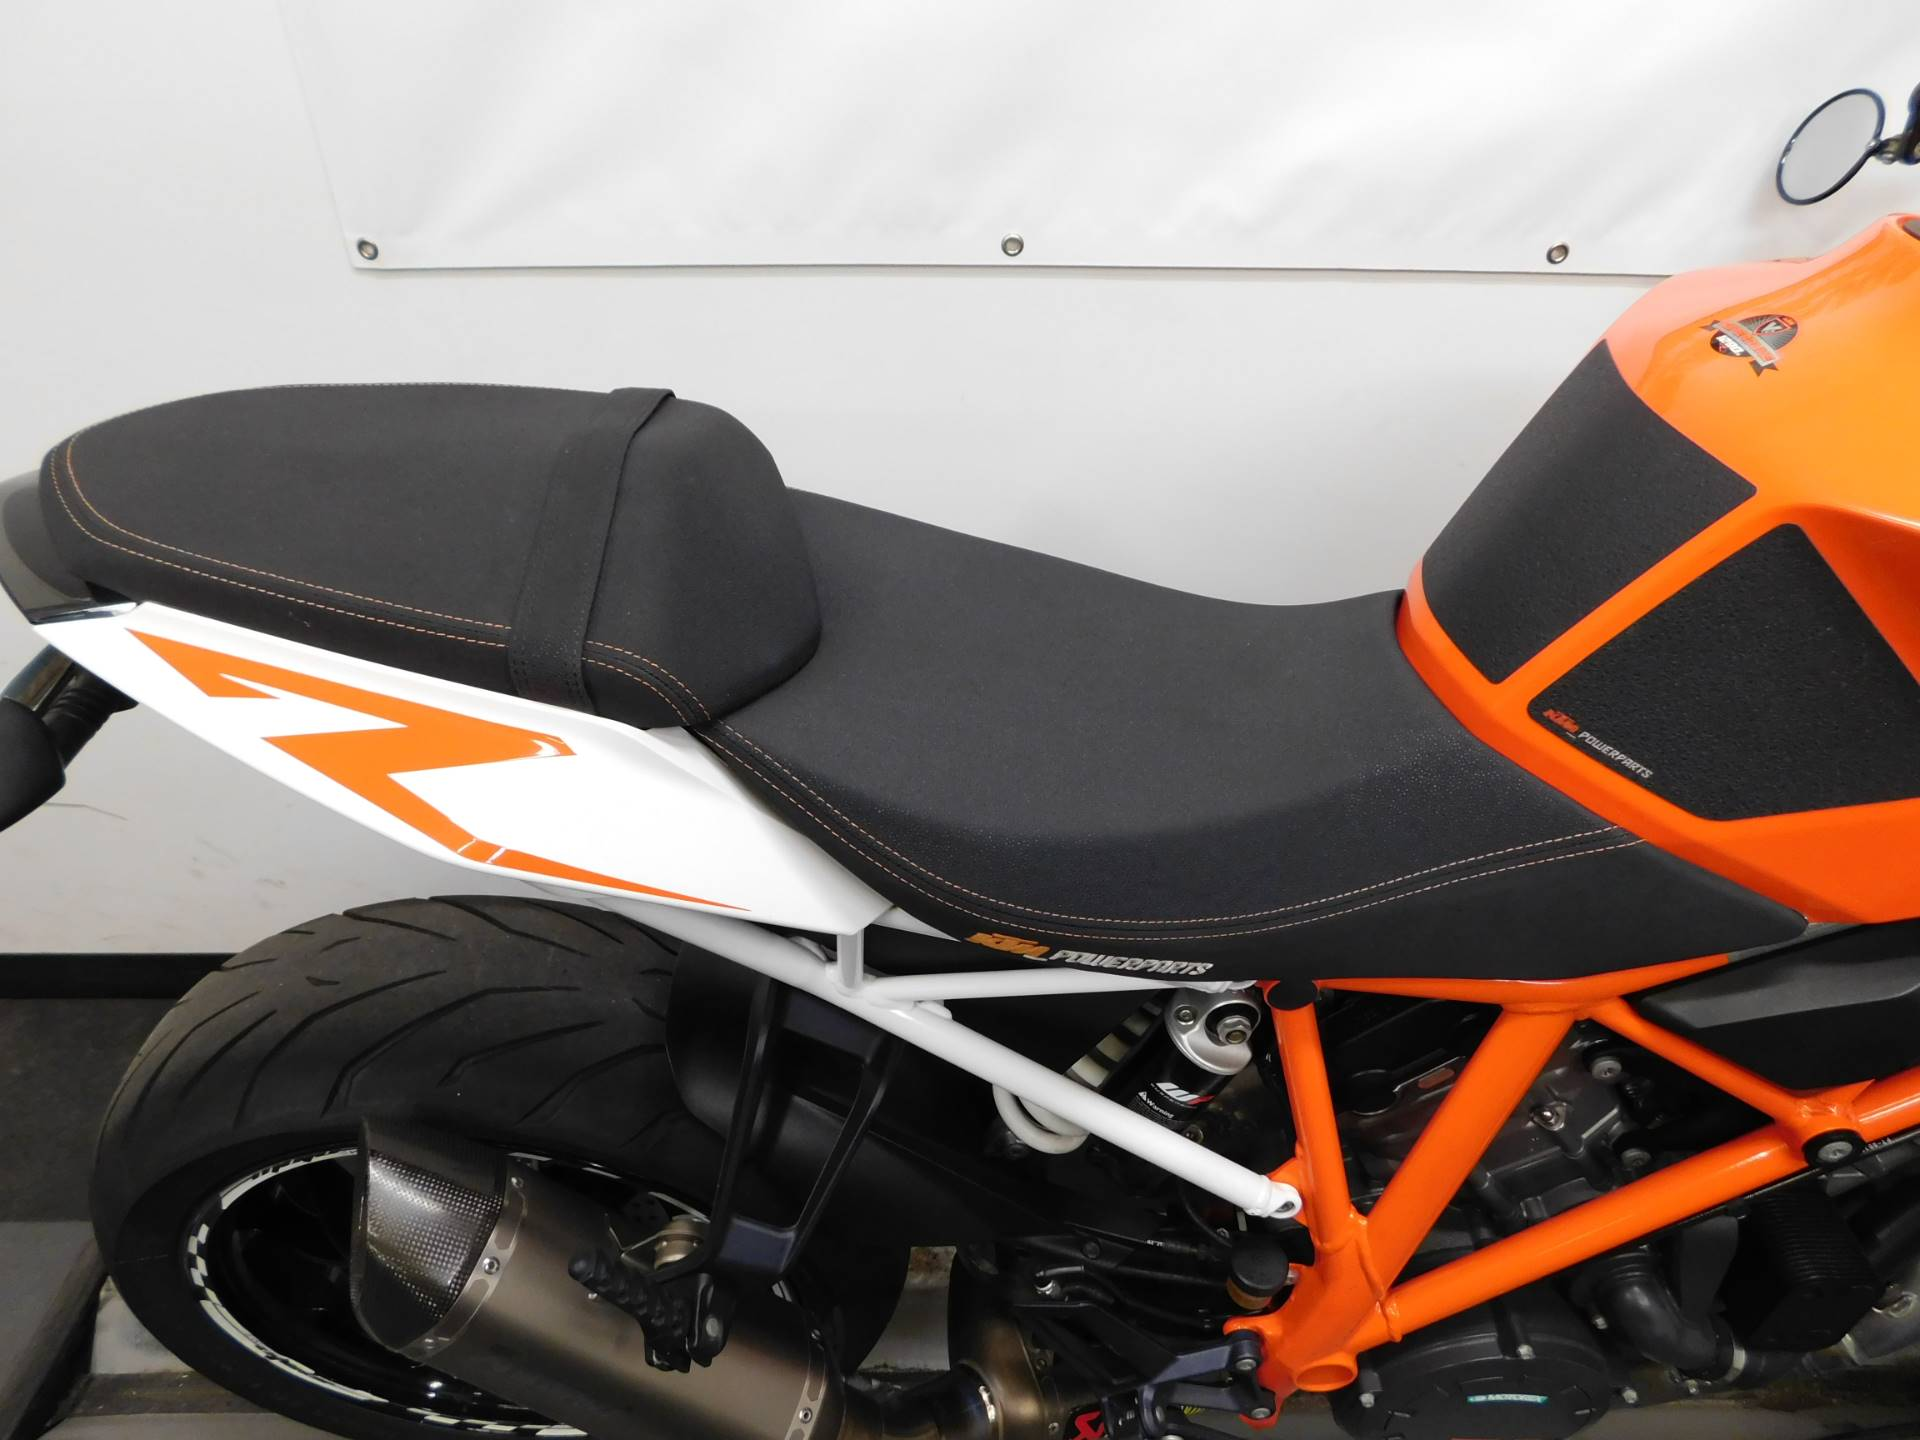 2015 KTM 1290 Super Duke R 12